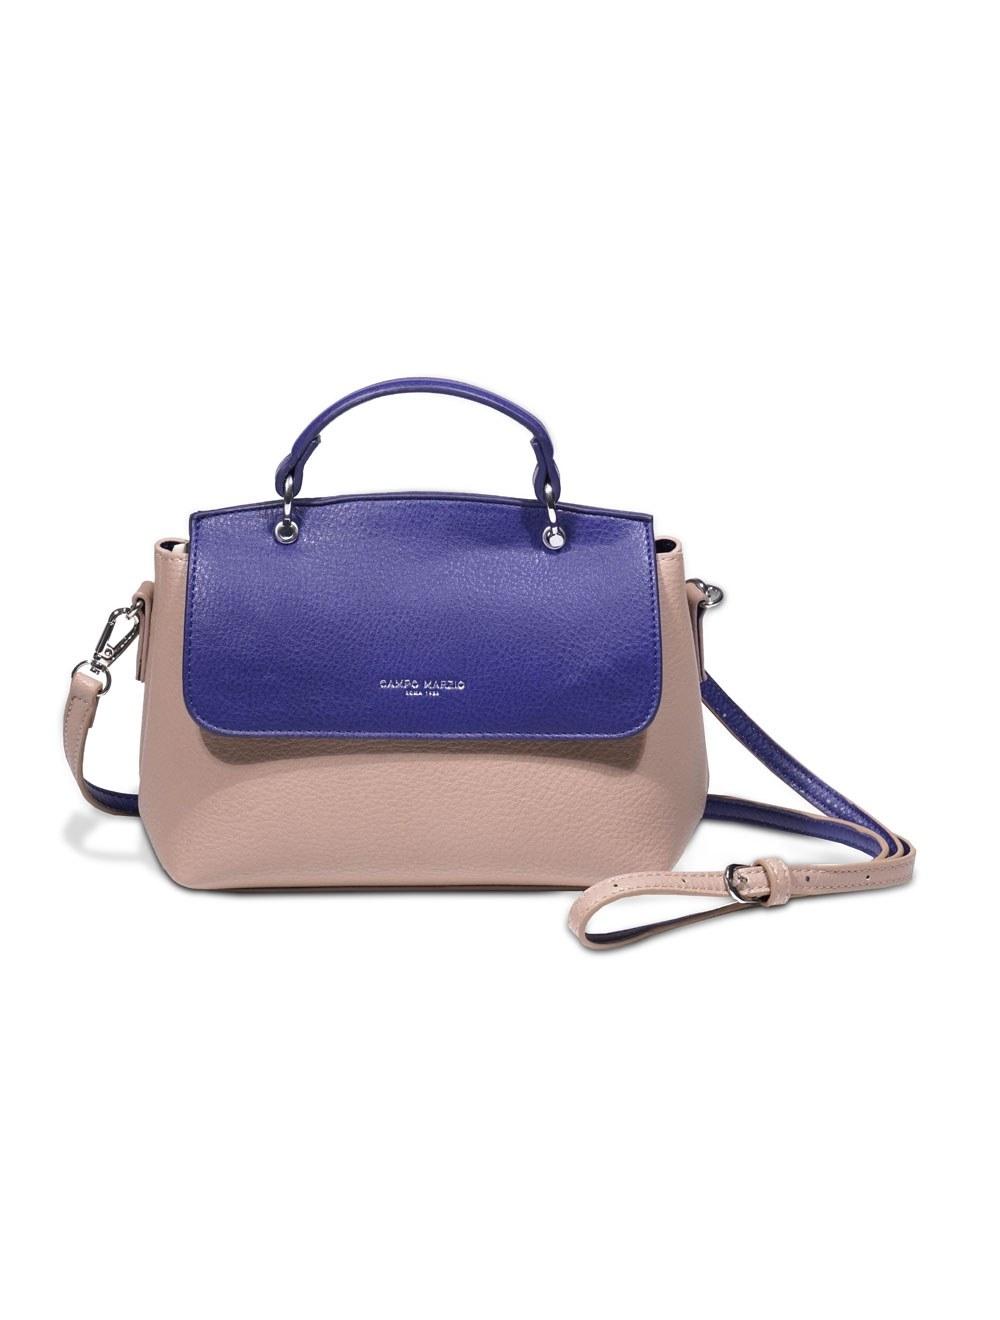 Claire Mini Bag - Sand